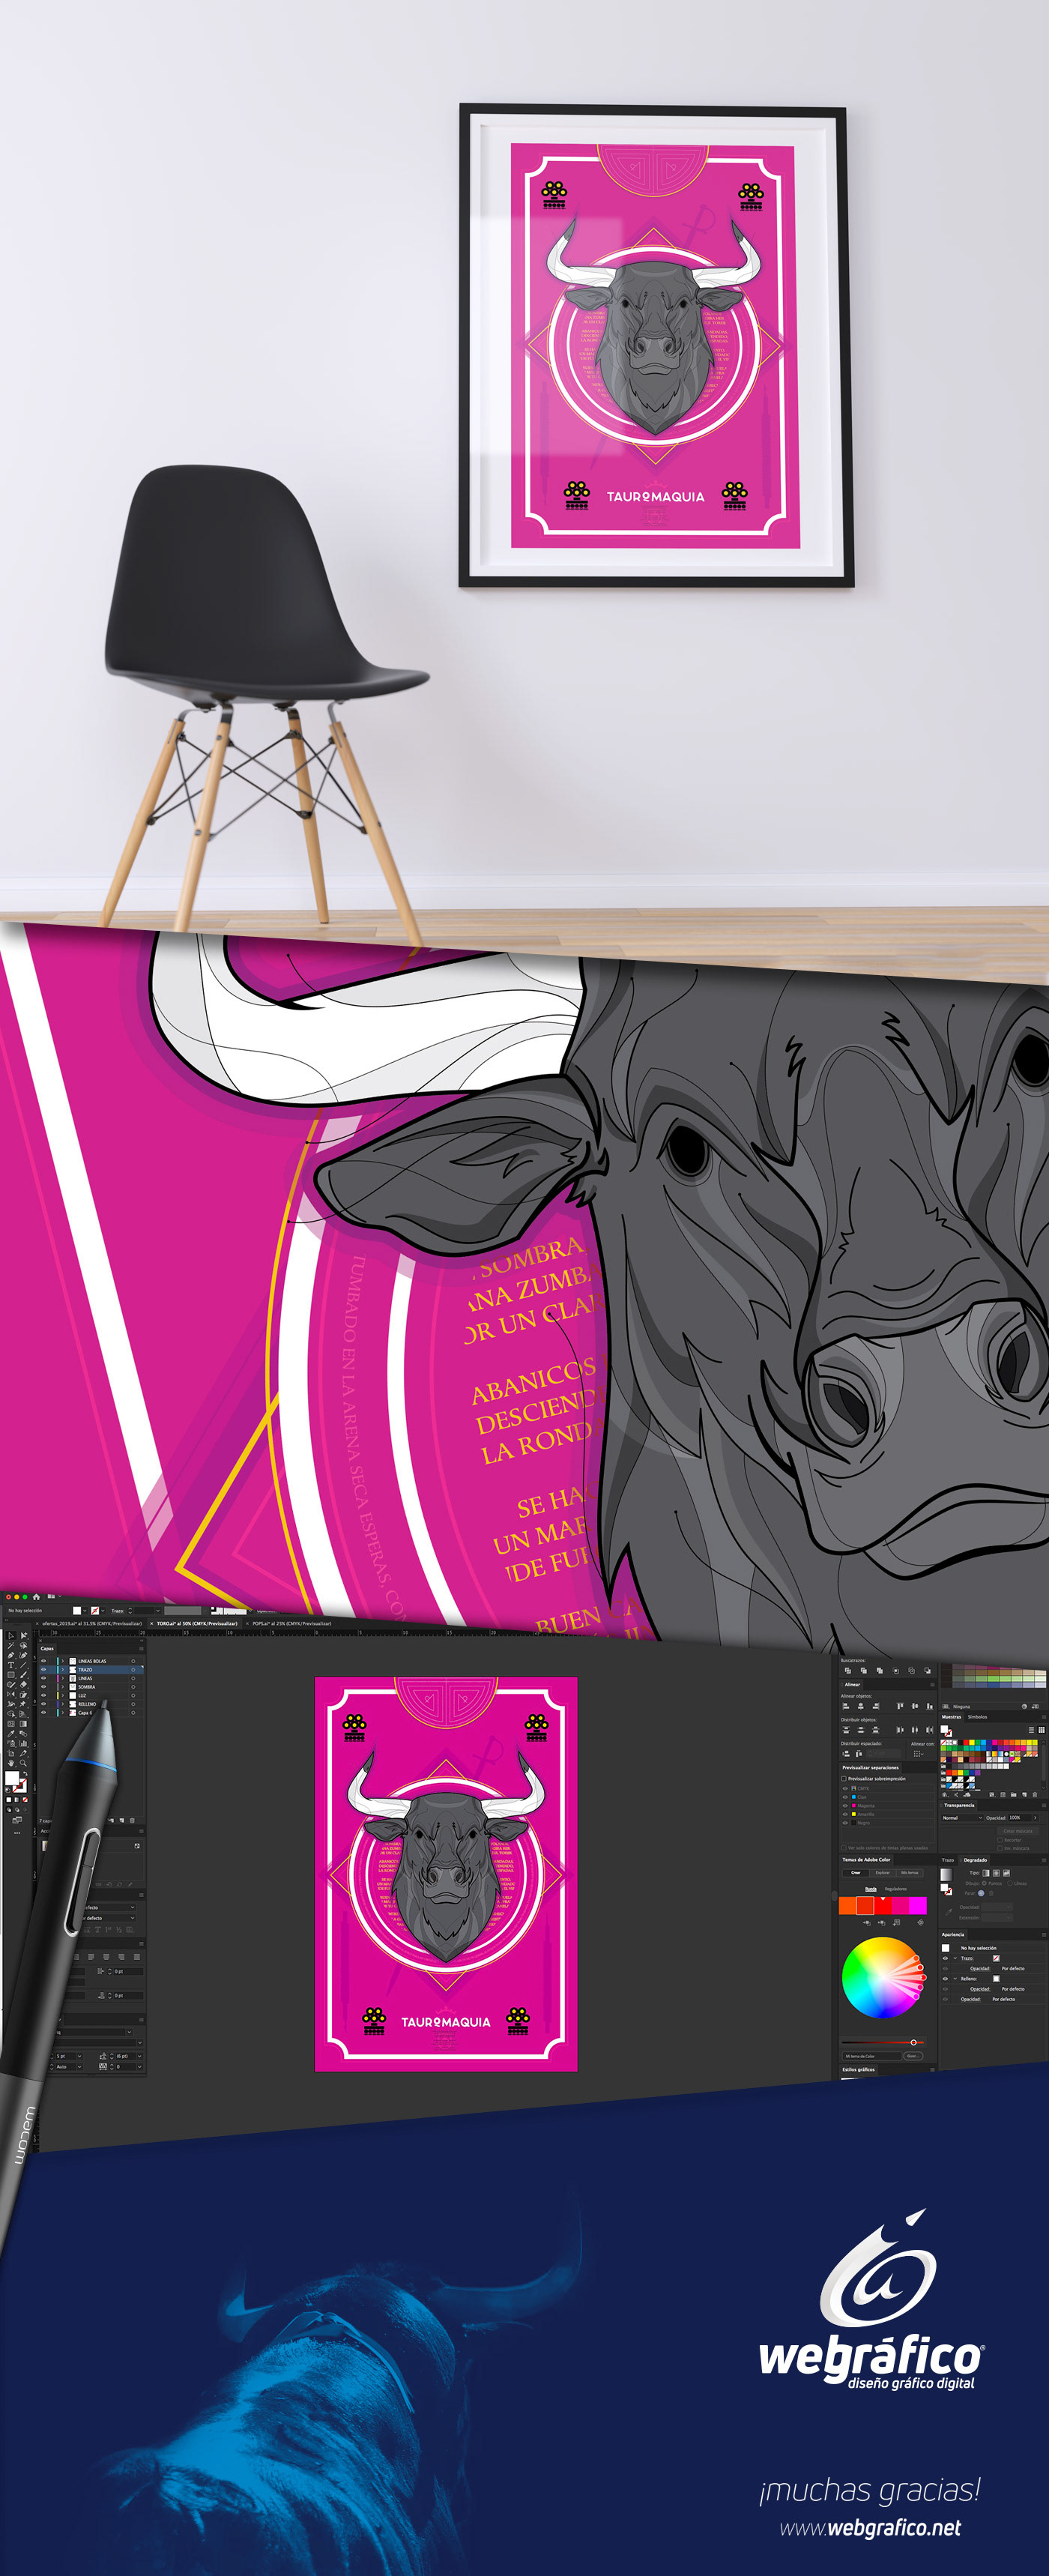 webgrafico miguel colunga aguascalientes tauromaquia toros ilustracion ILLUSTRATION